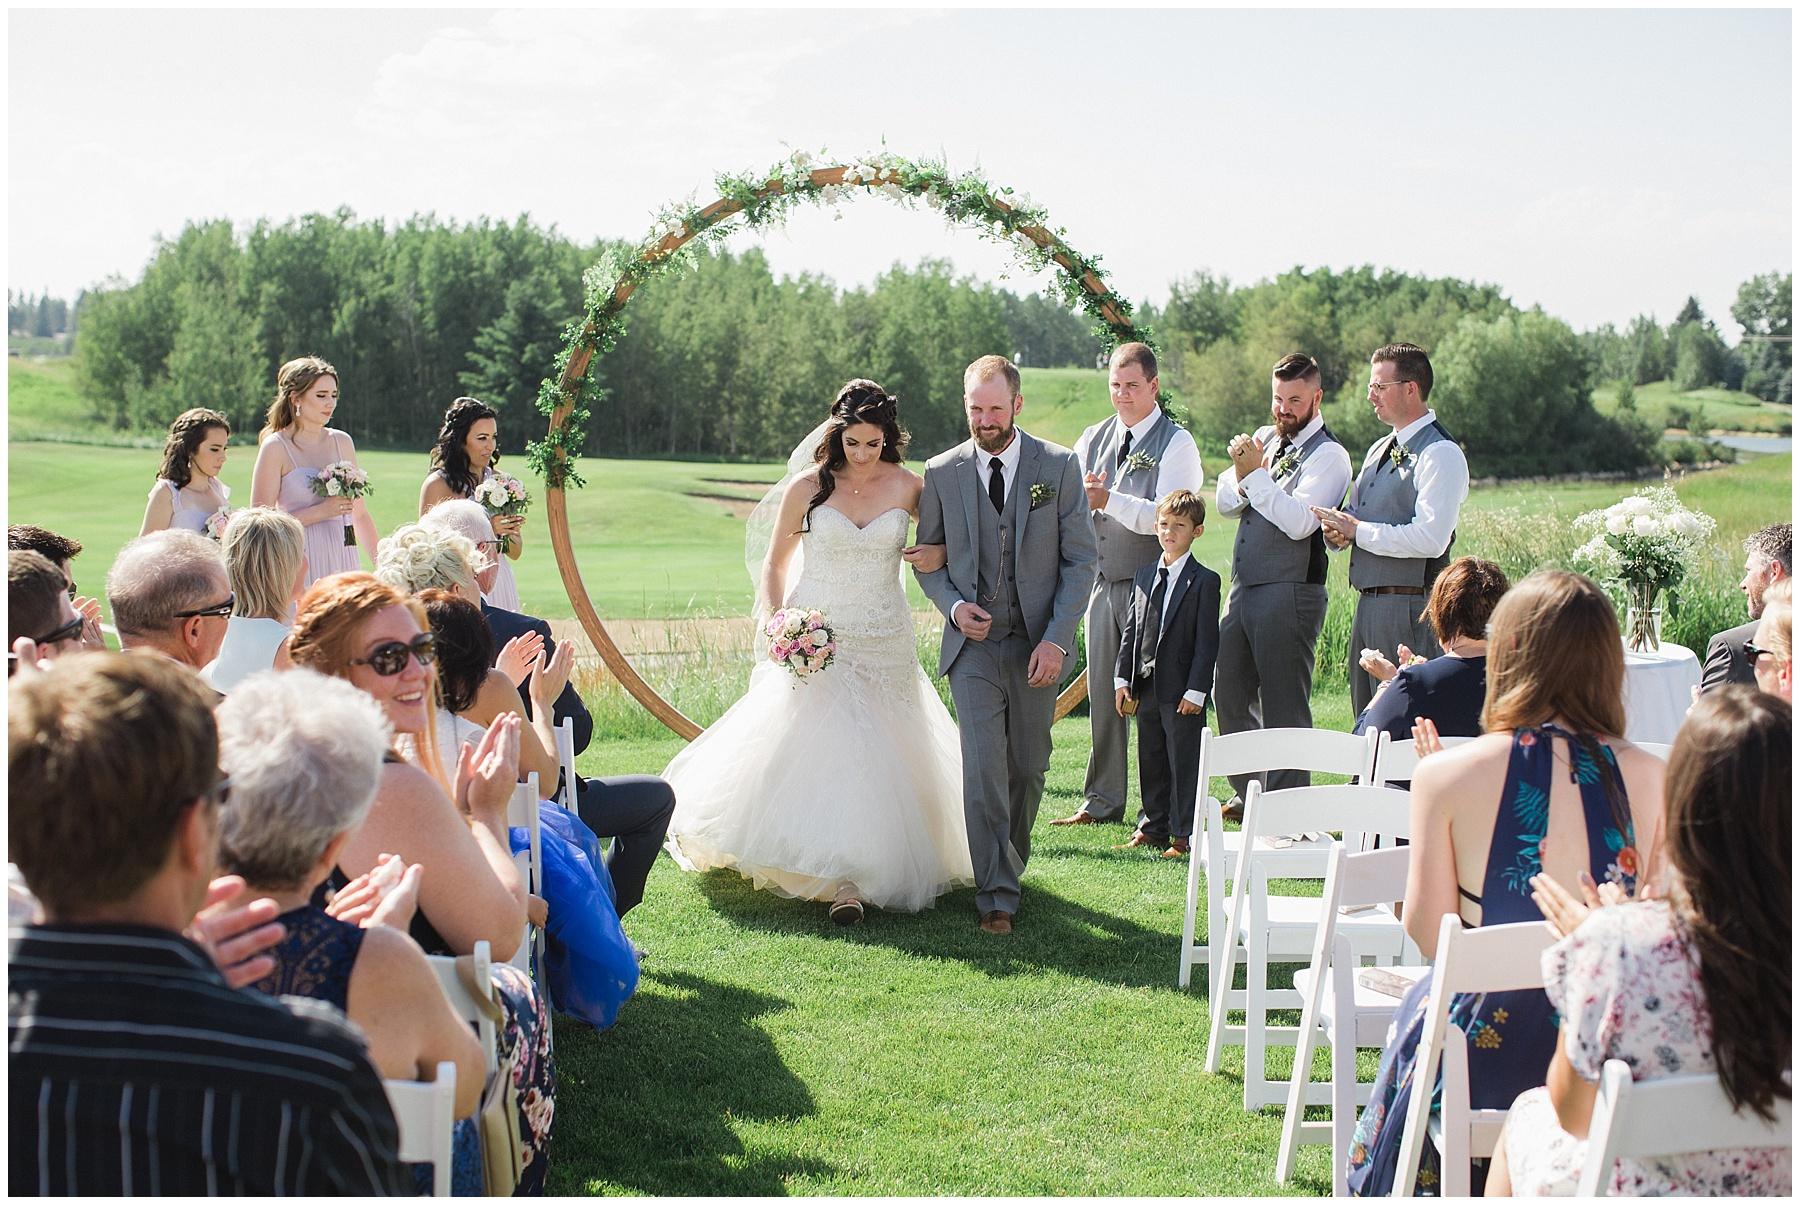 Calgary_Wedding_Photography_Carnmoney_Golf_Club_06.jpg